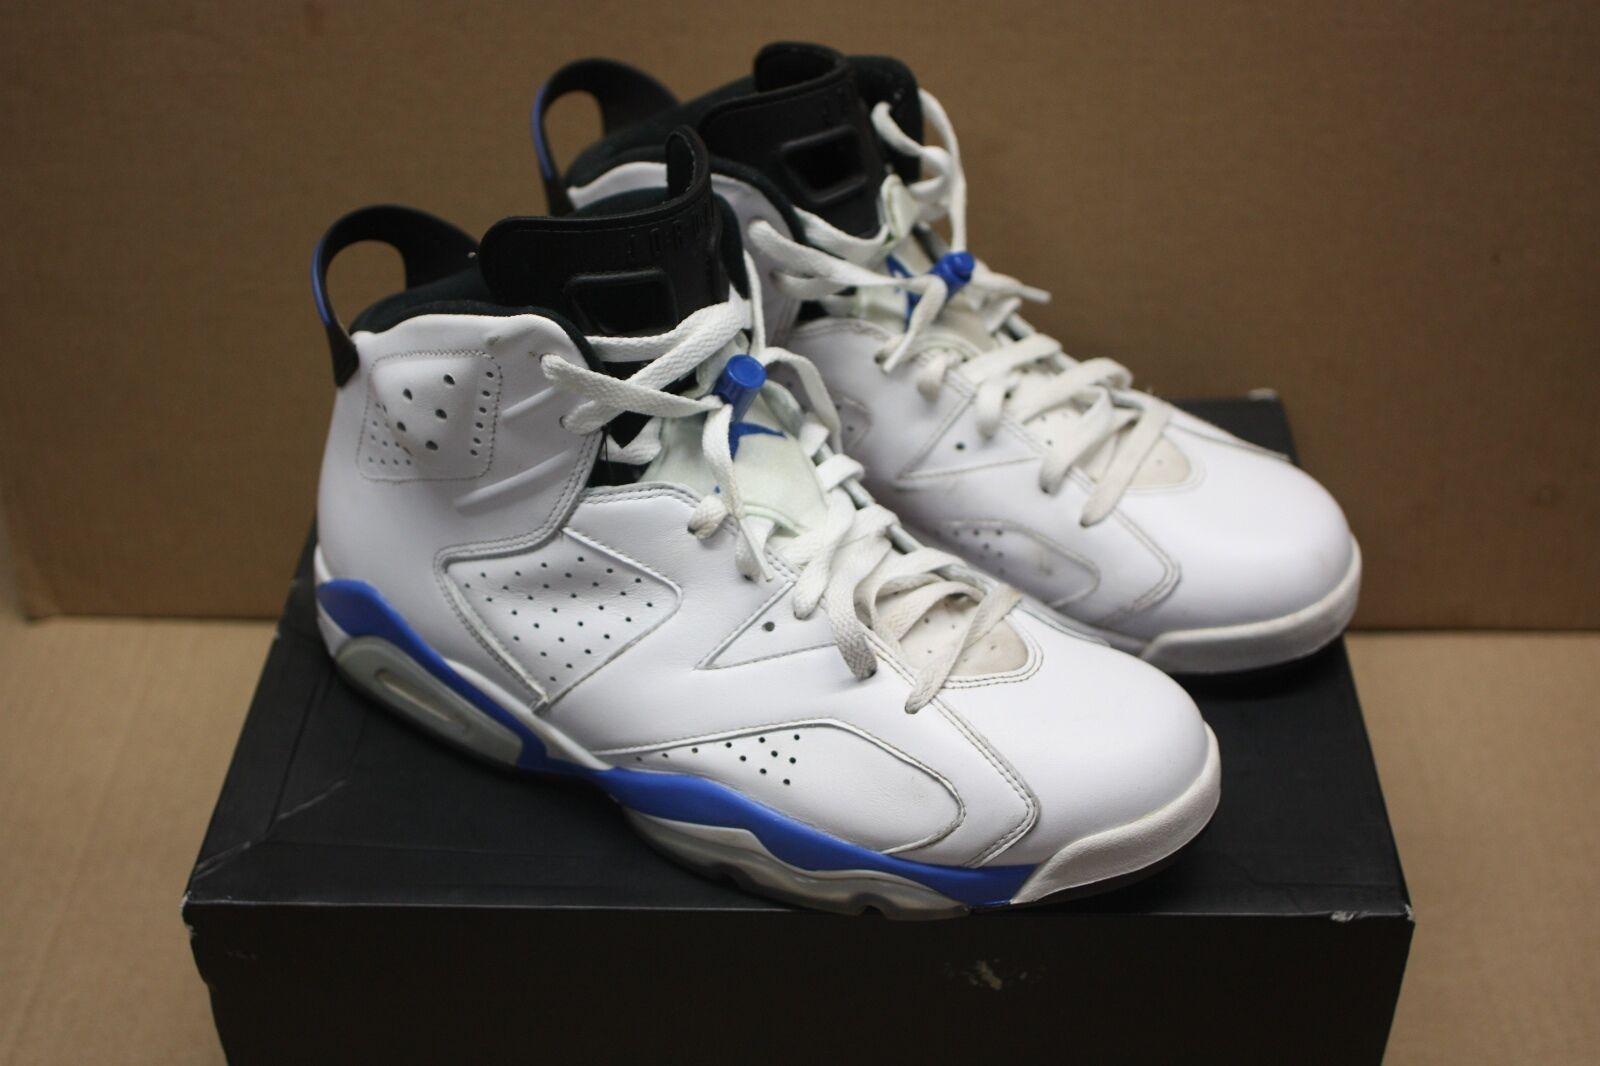 Nike Air Jordan VI Retro 6 White  Sport blueee Black (384664-107) Size 12 US  11UK